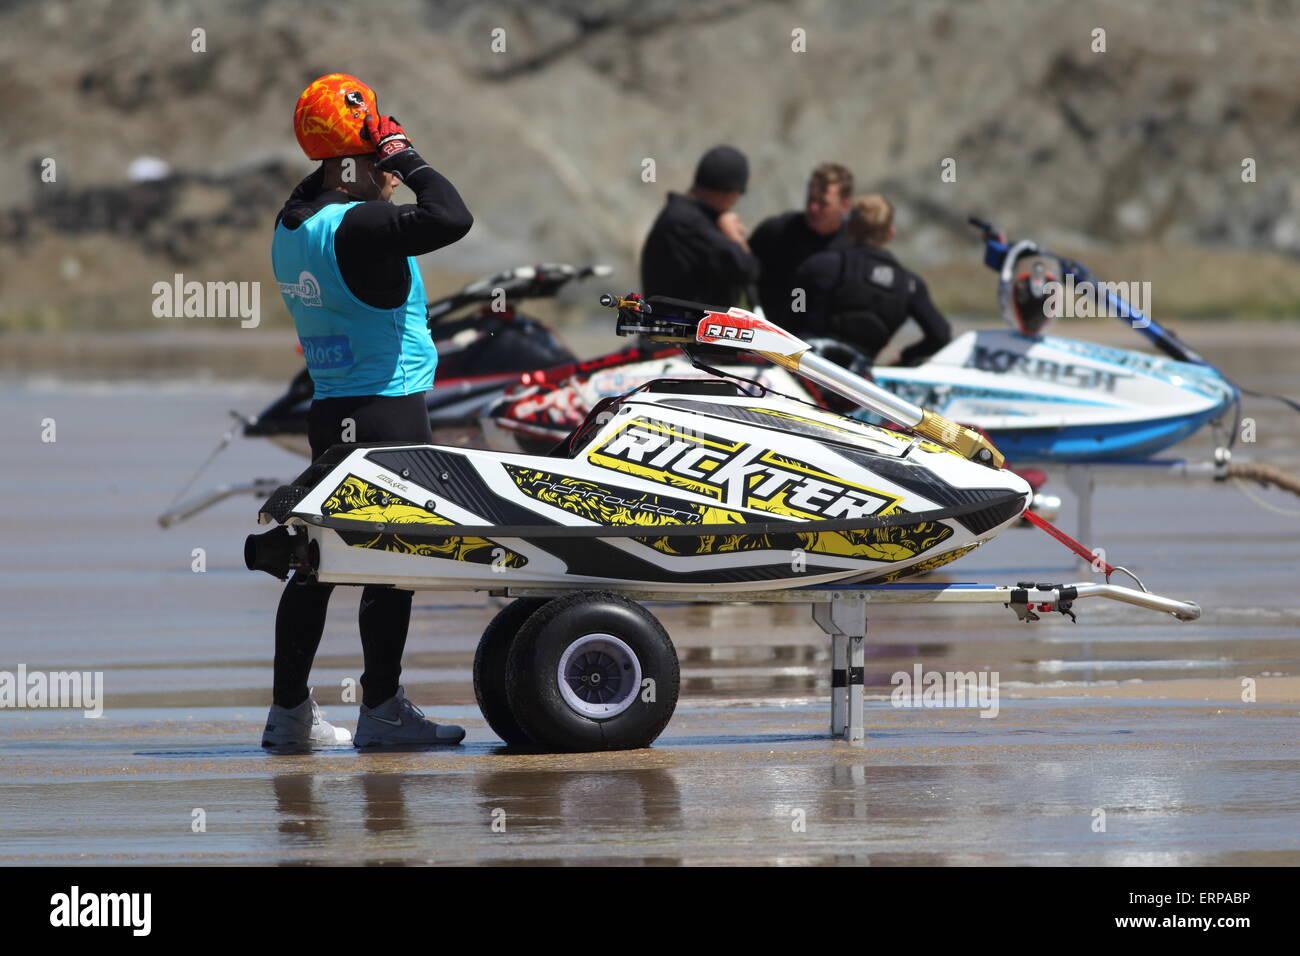 Fistral Strand, Newquay, Cornwall, UK. 6. Juni 2015. Professionelle Jestski Fahrer konkurrieren bei der IFWA Tour Stockbild